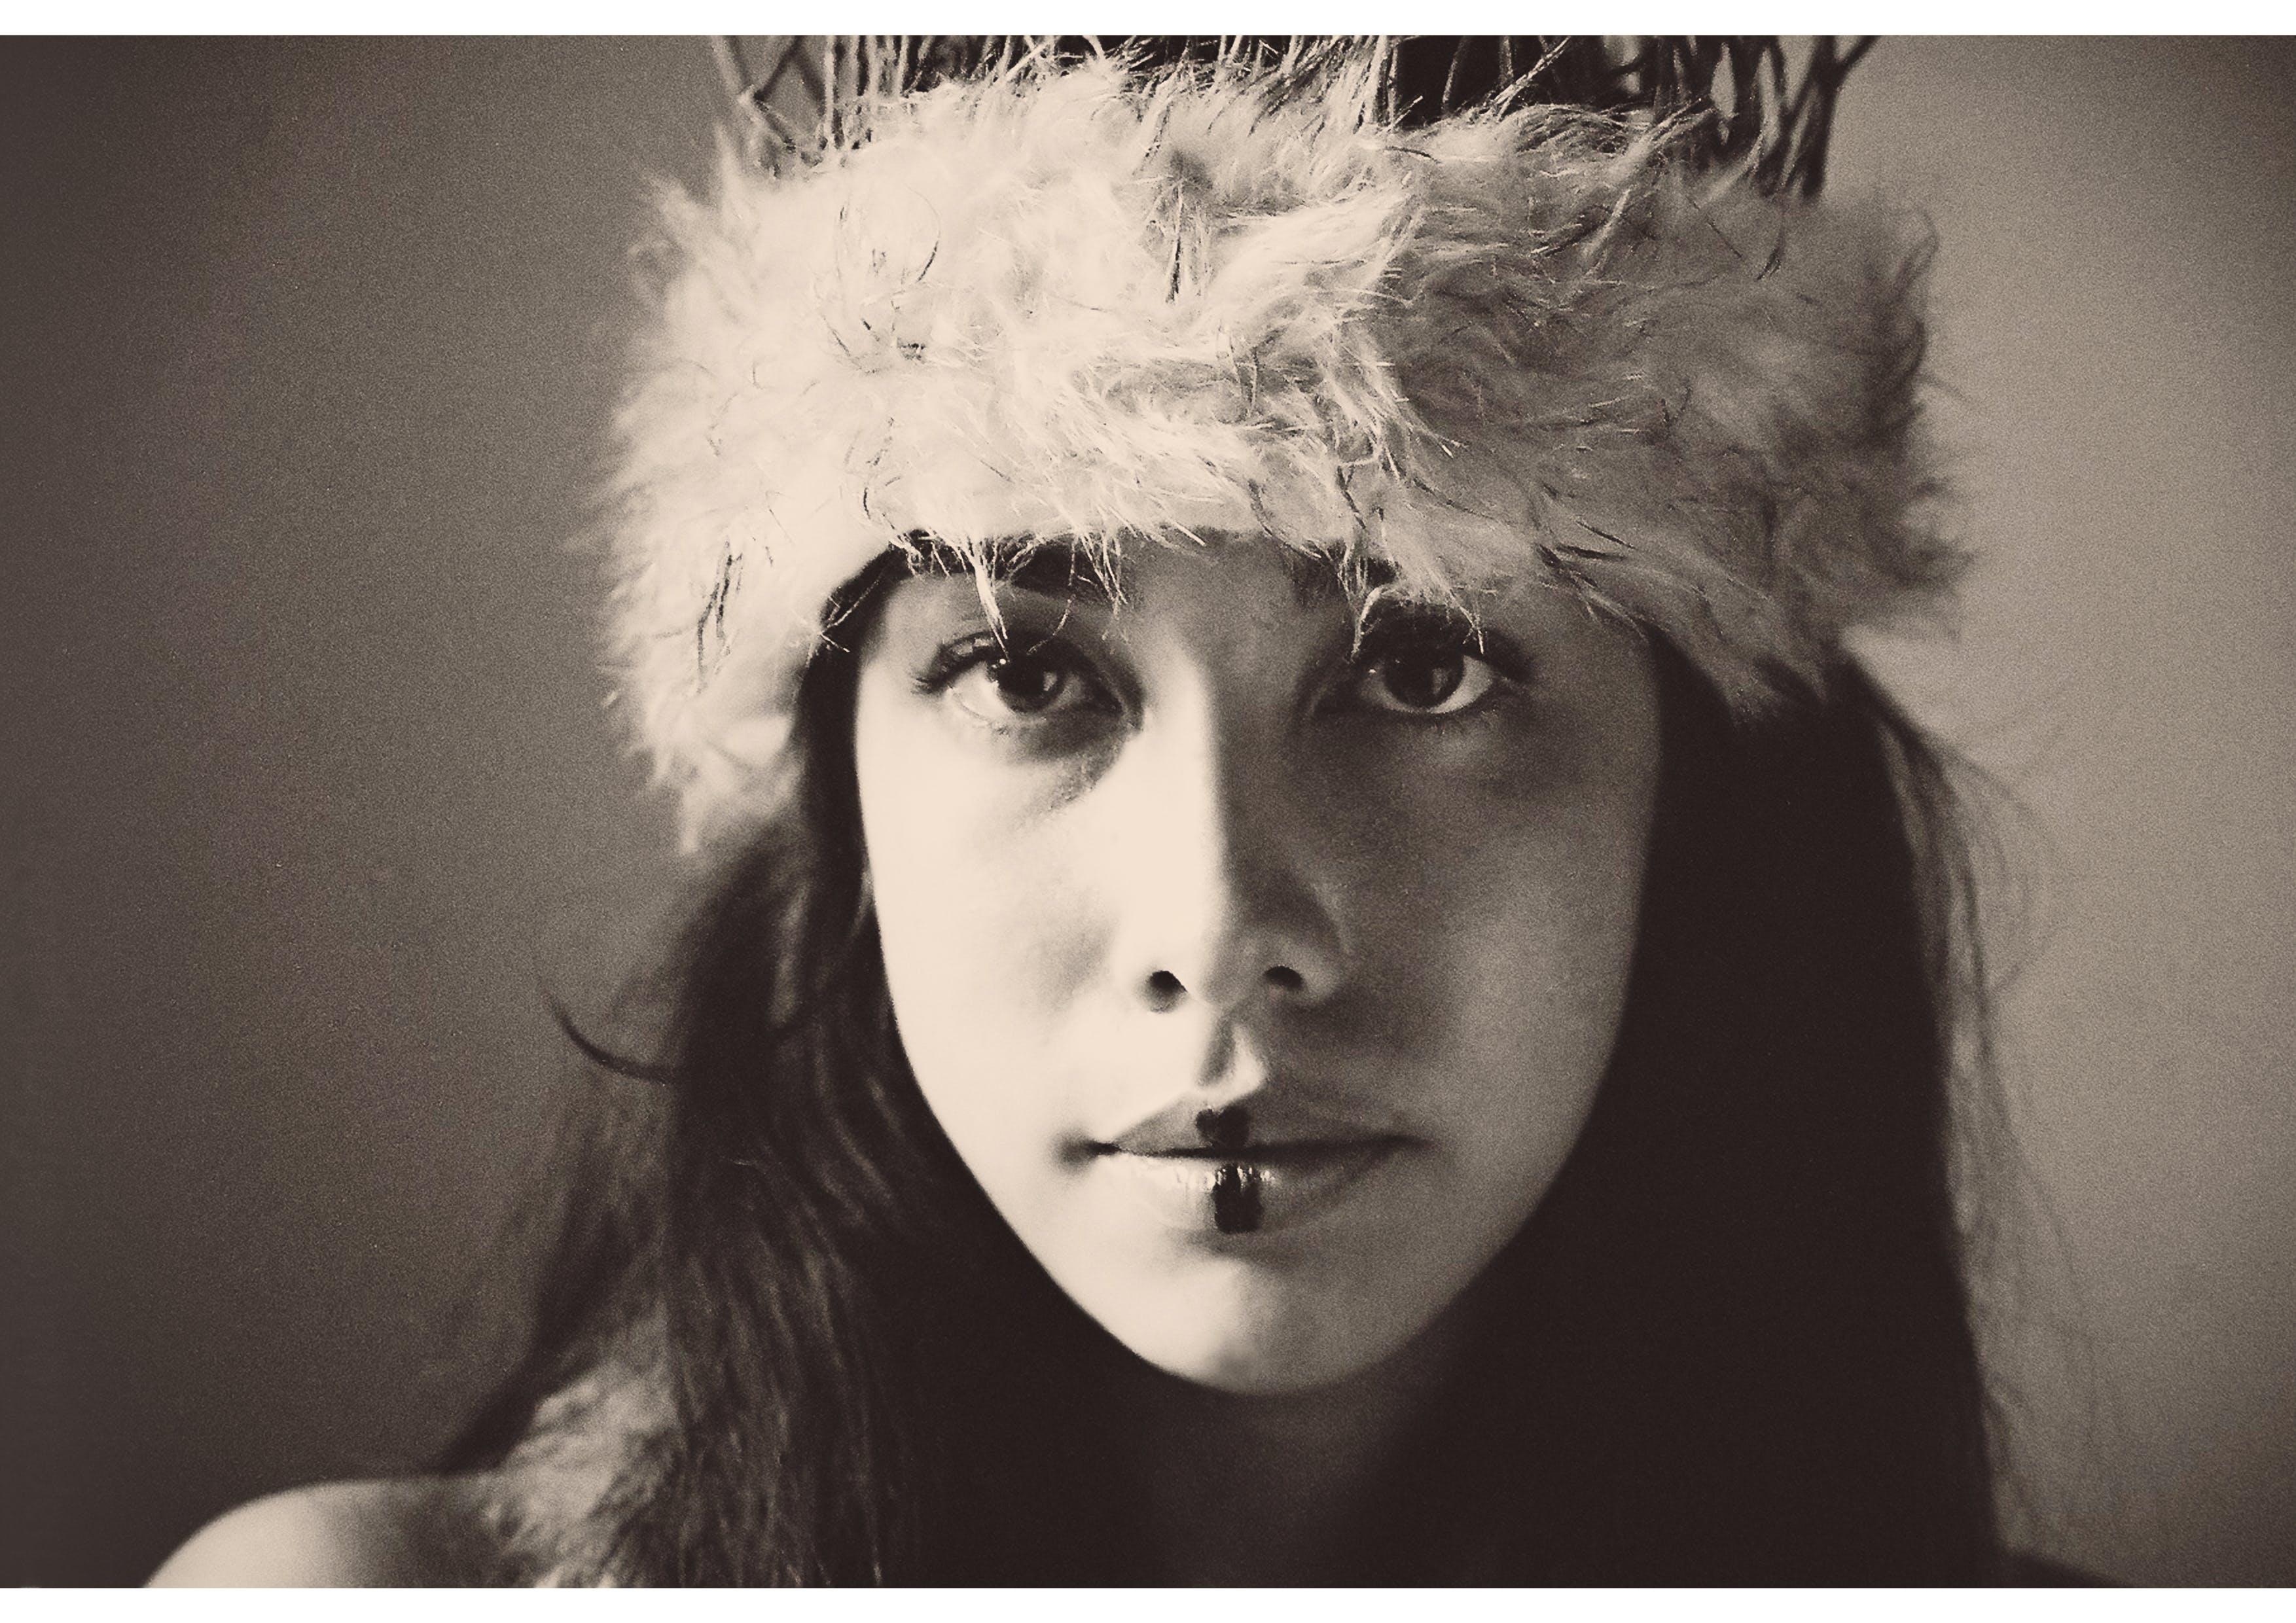 Photo Of Woman Wearing Fuzzy Headband